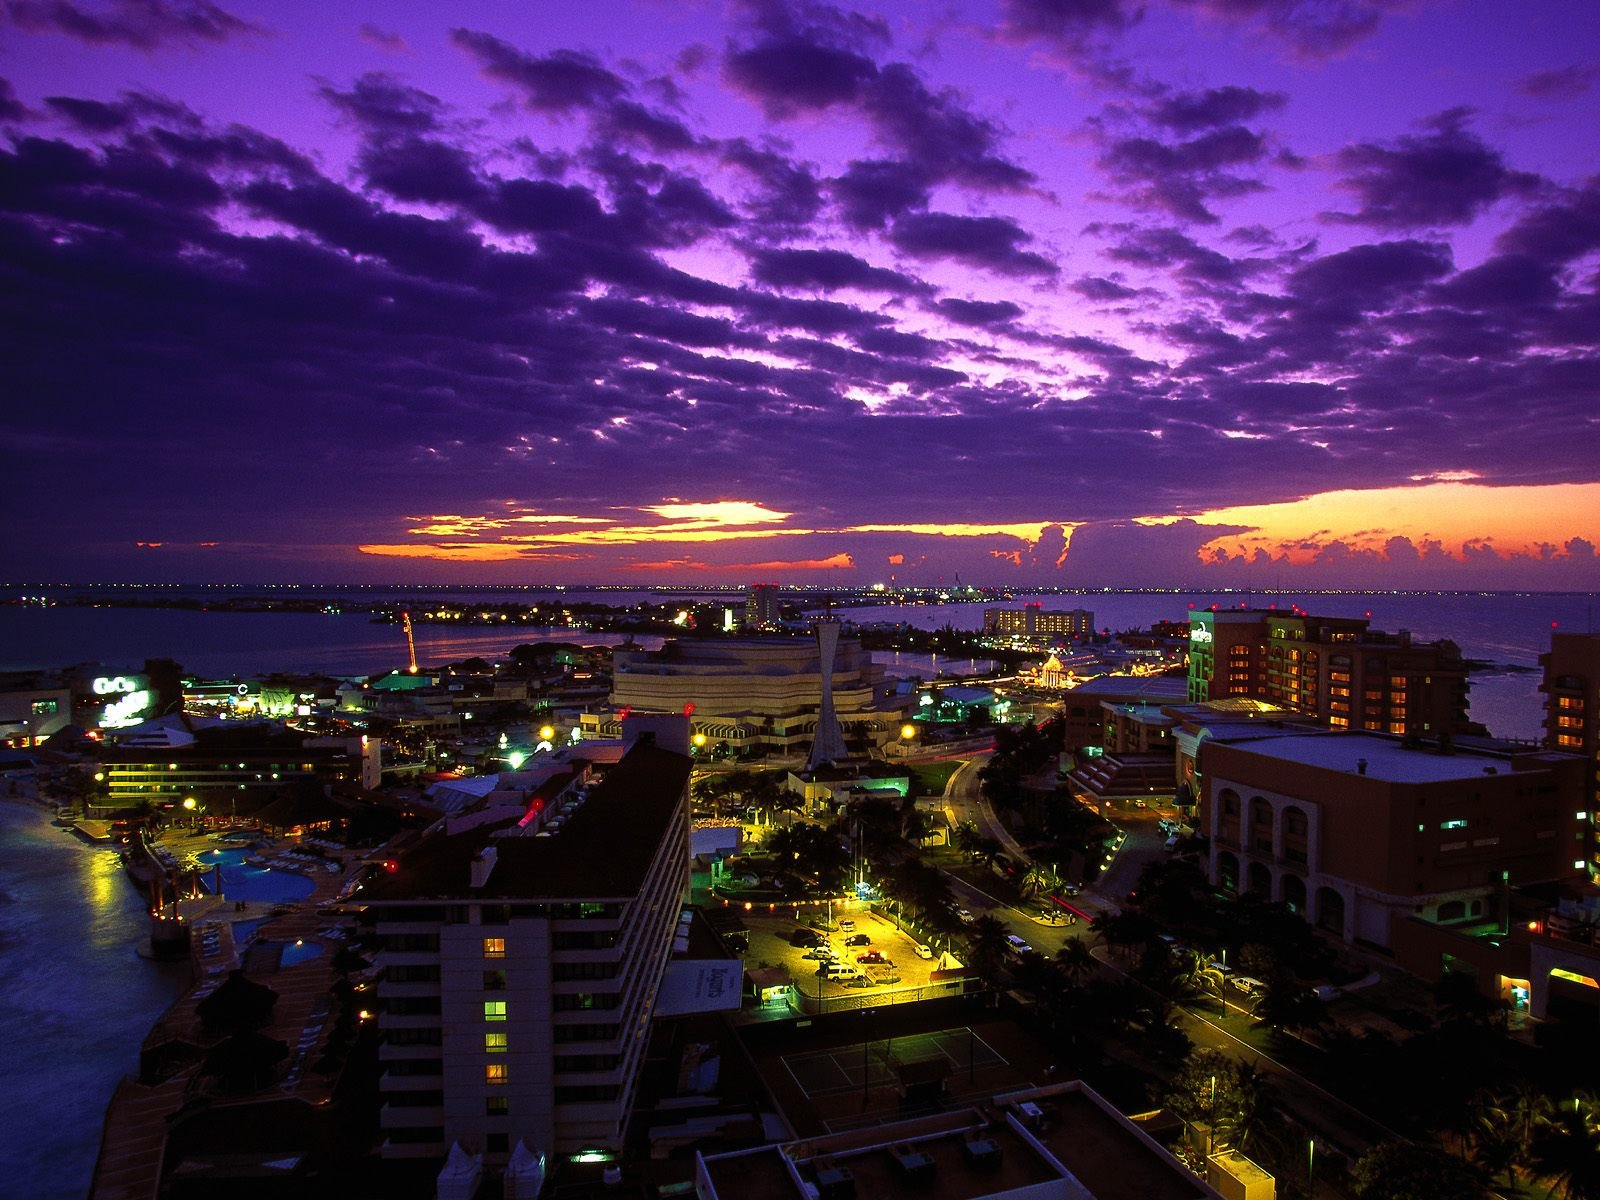 огни город море сумерки lights the city sea twilight  № 2659530 бесплатно